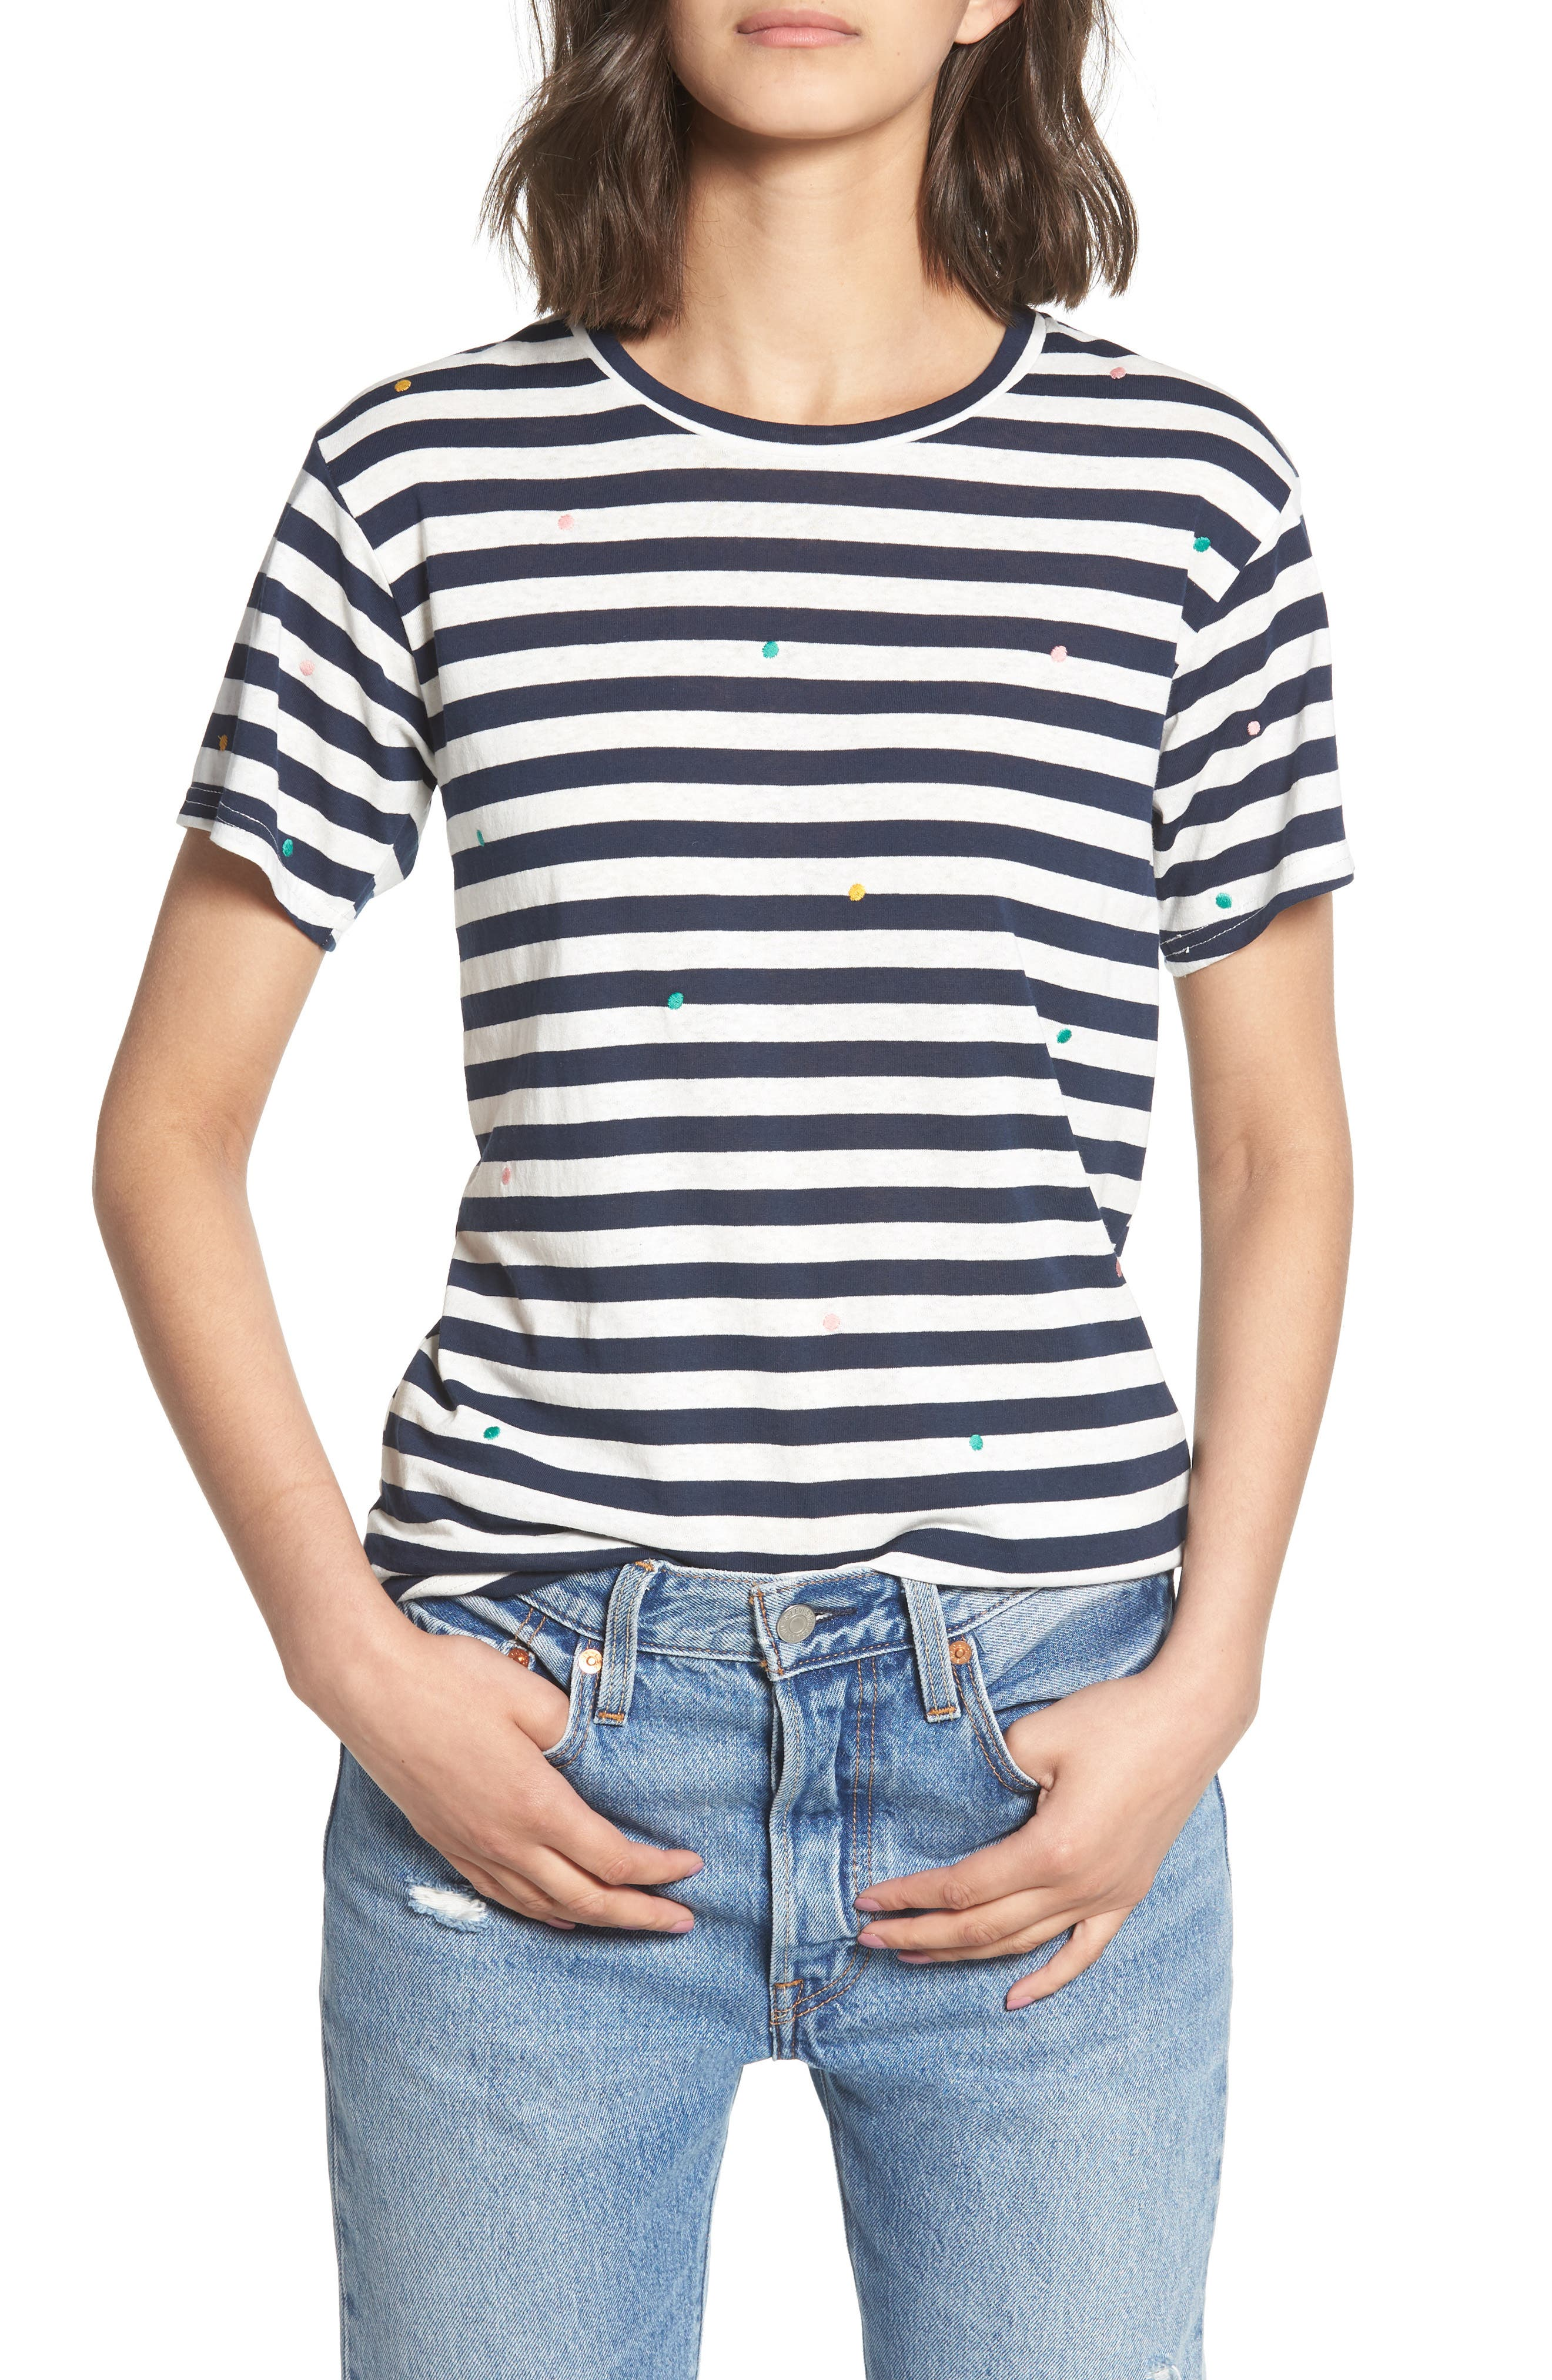 Polka Dot Embroidered Stripe Tee,                             Main thumbnail 1, color,                             Navy/ White